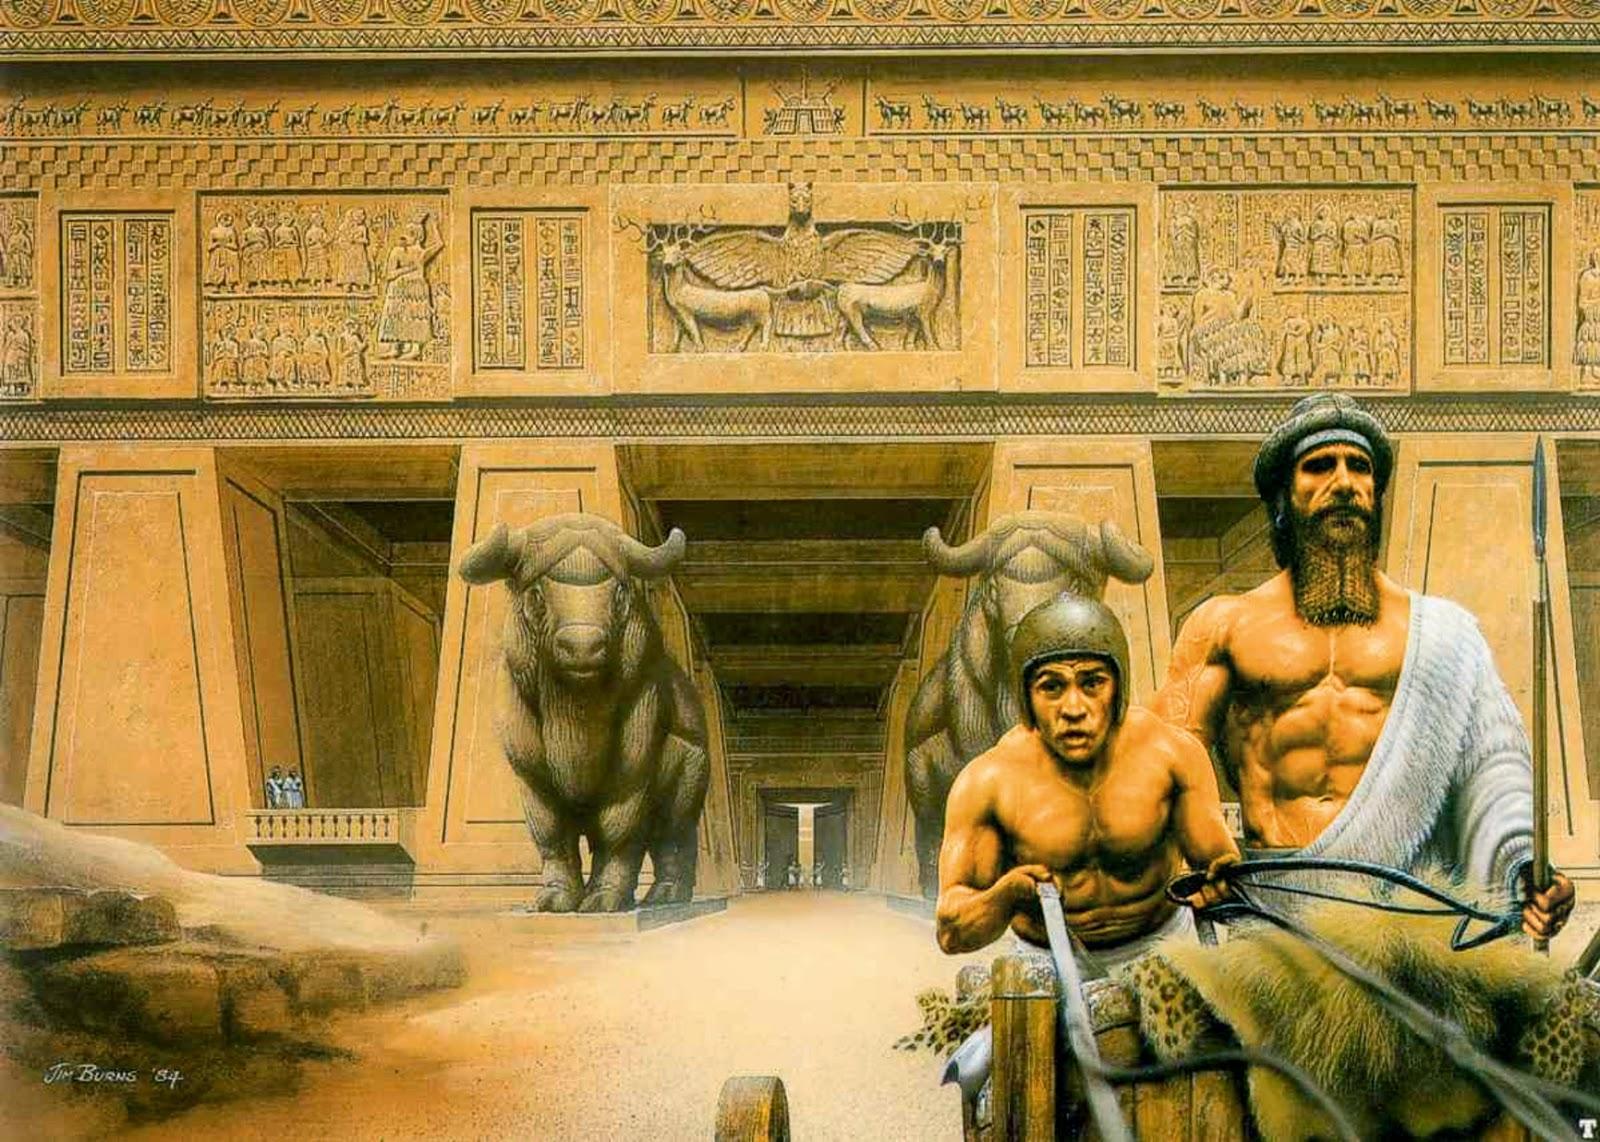 Alternative Ancient Anunnaki History Of The Tower Of Babel